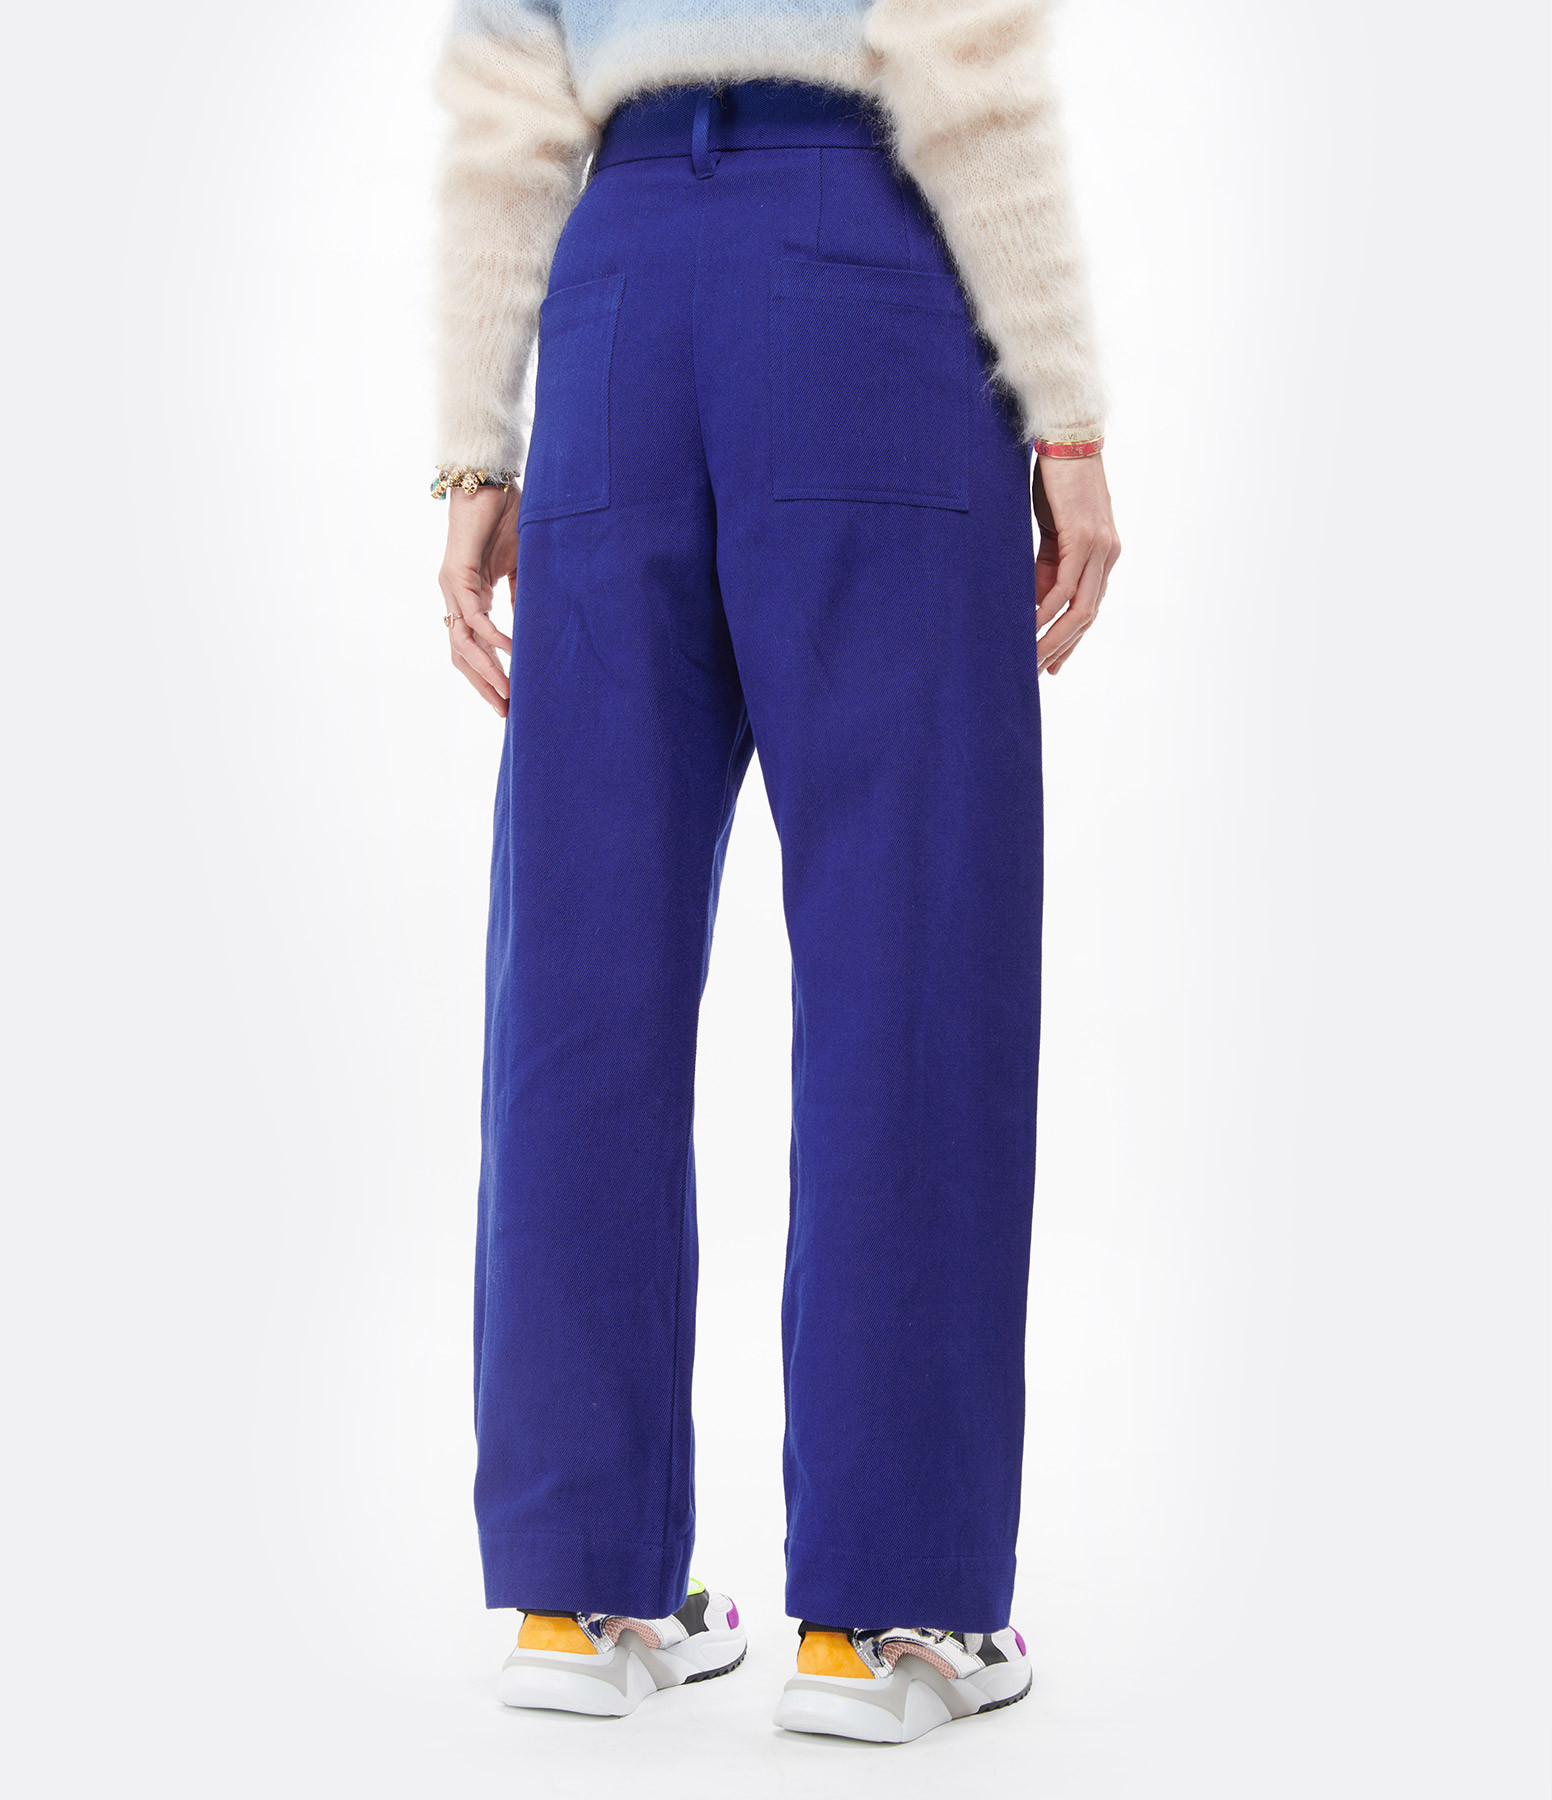 MII - Pantalon Miti Denim Biologique Bleu Lapis